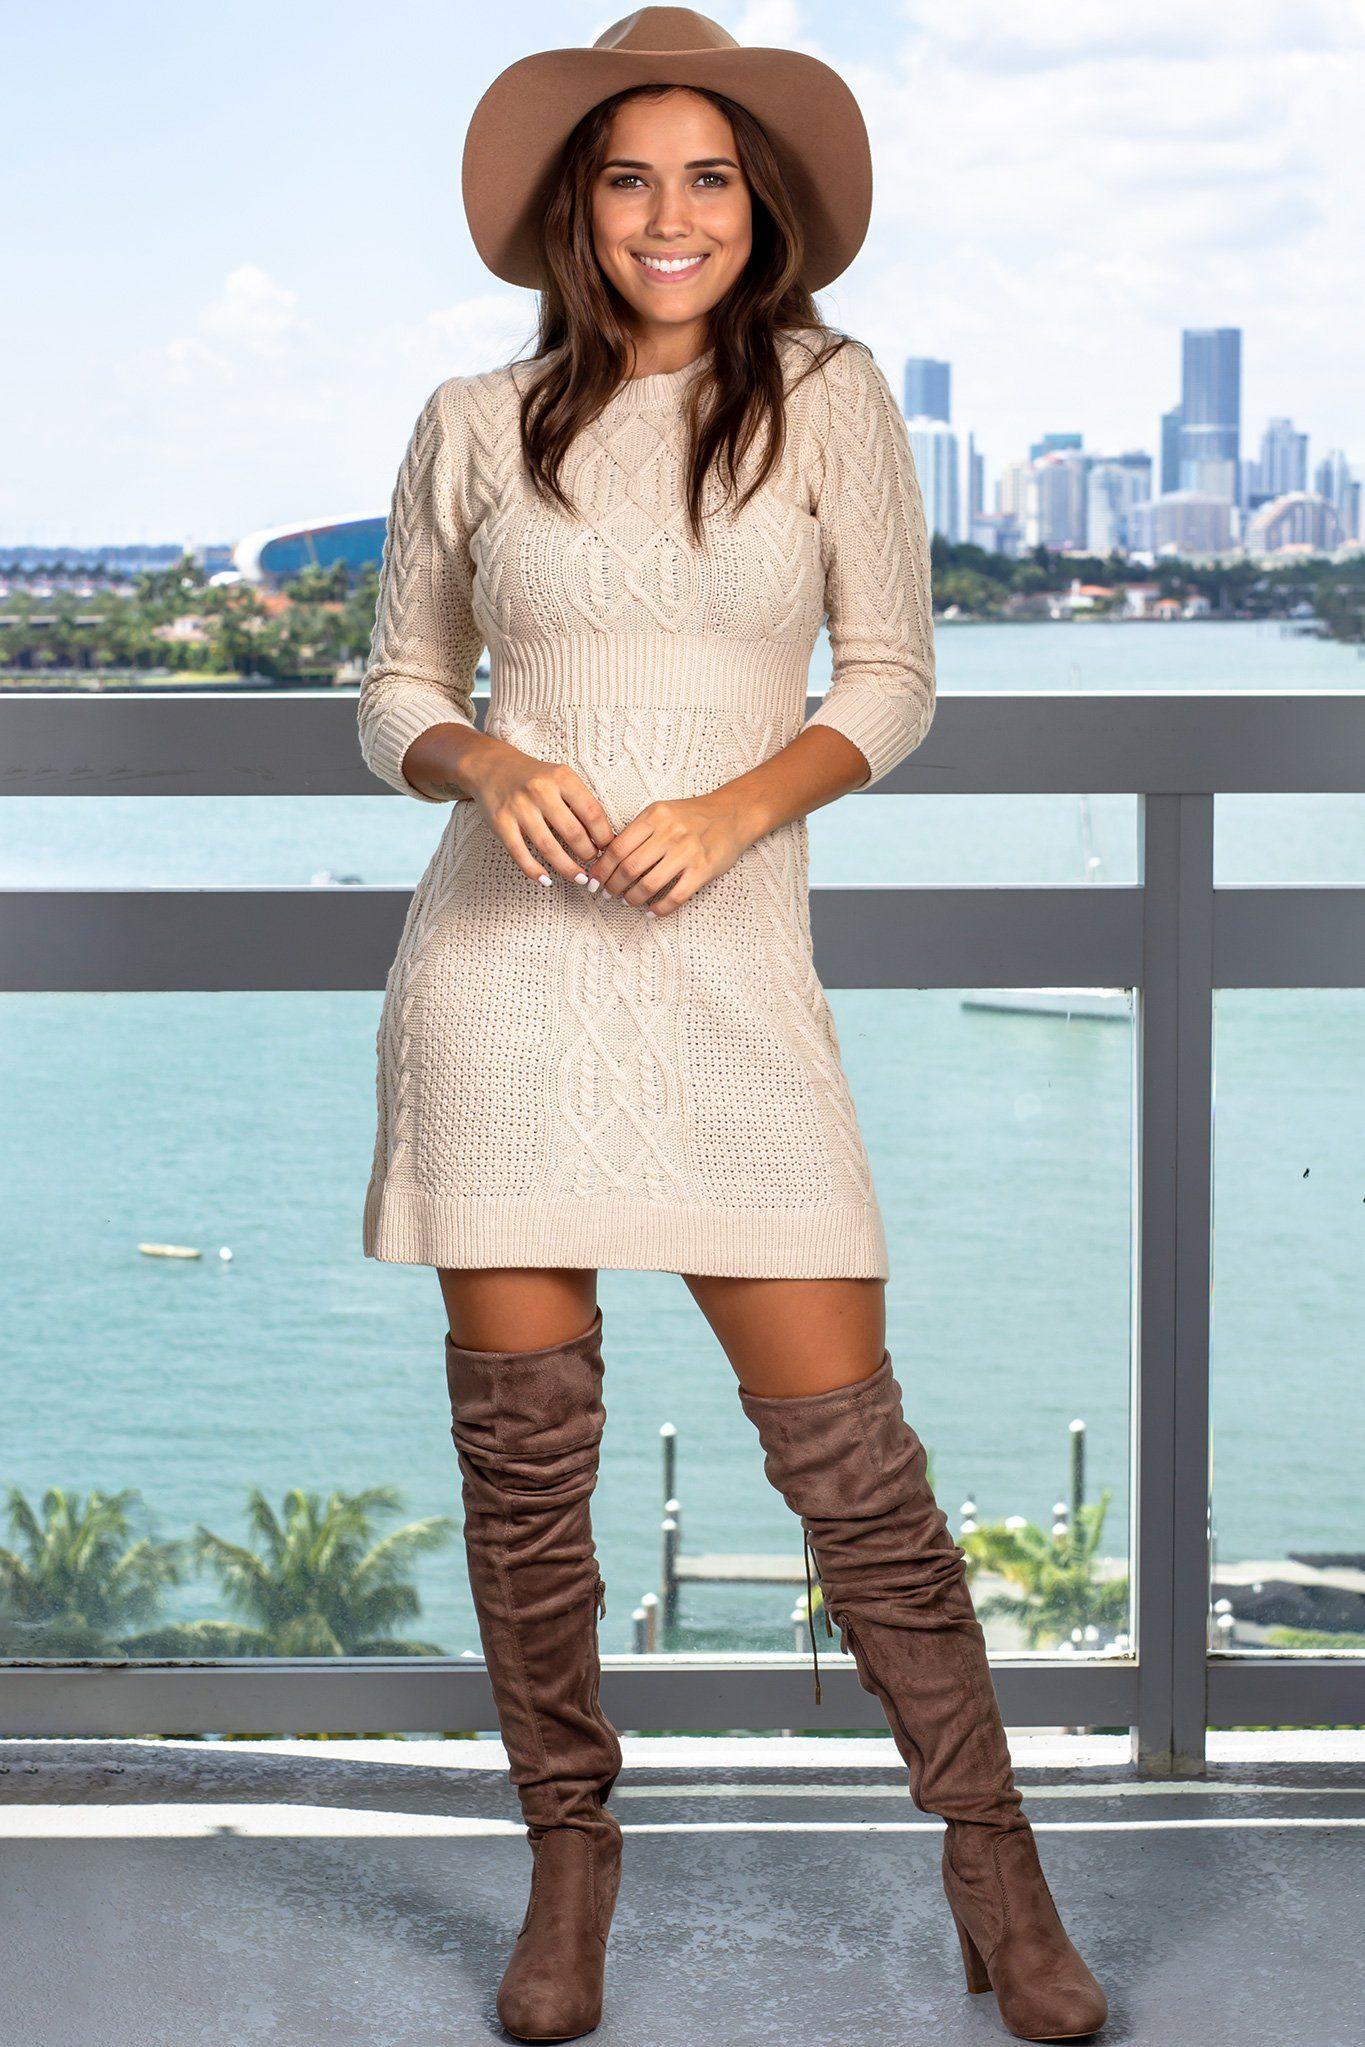 Oatmeal Knit Sweater Dress Sweater Dress Cute Sweater Dresses Knit Sweater Dress [ 2047 x 1365 Pixel ]